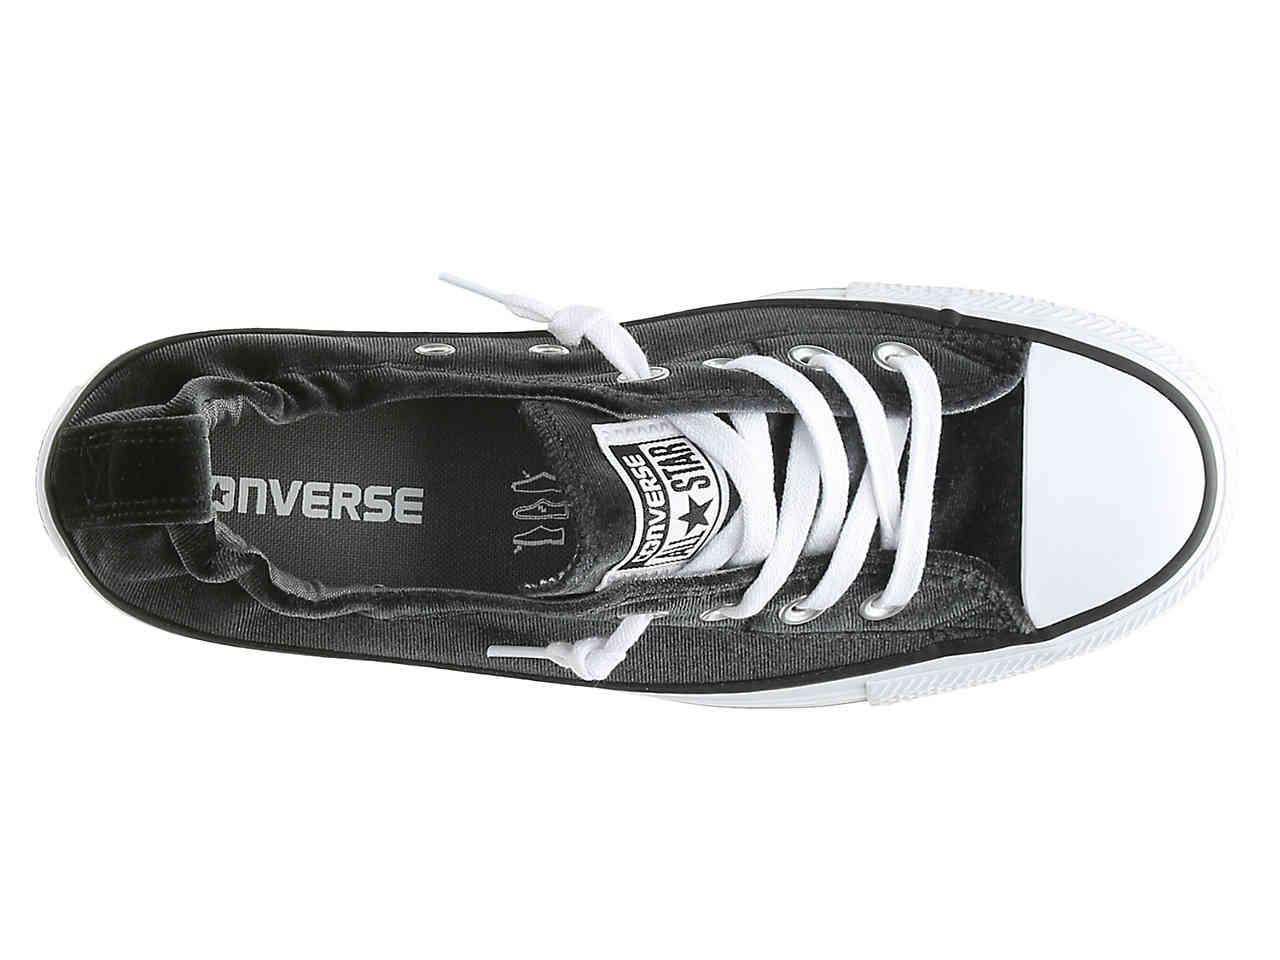 baf5df531d1530 Lyst - Converse Chuck Taylor All Star Shoreline Velvet Slip-on ...